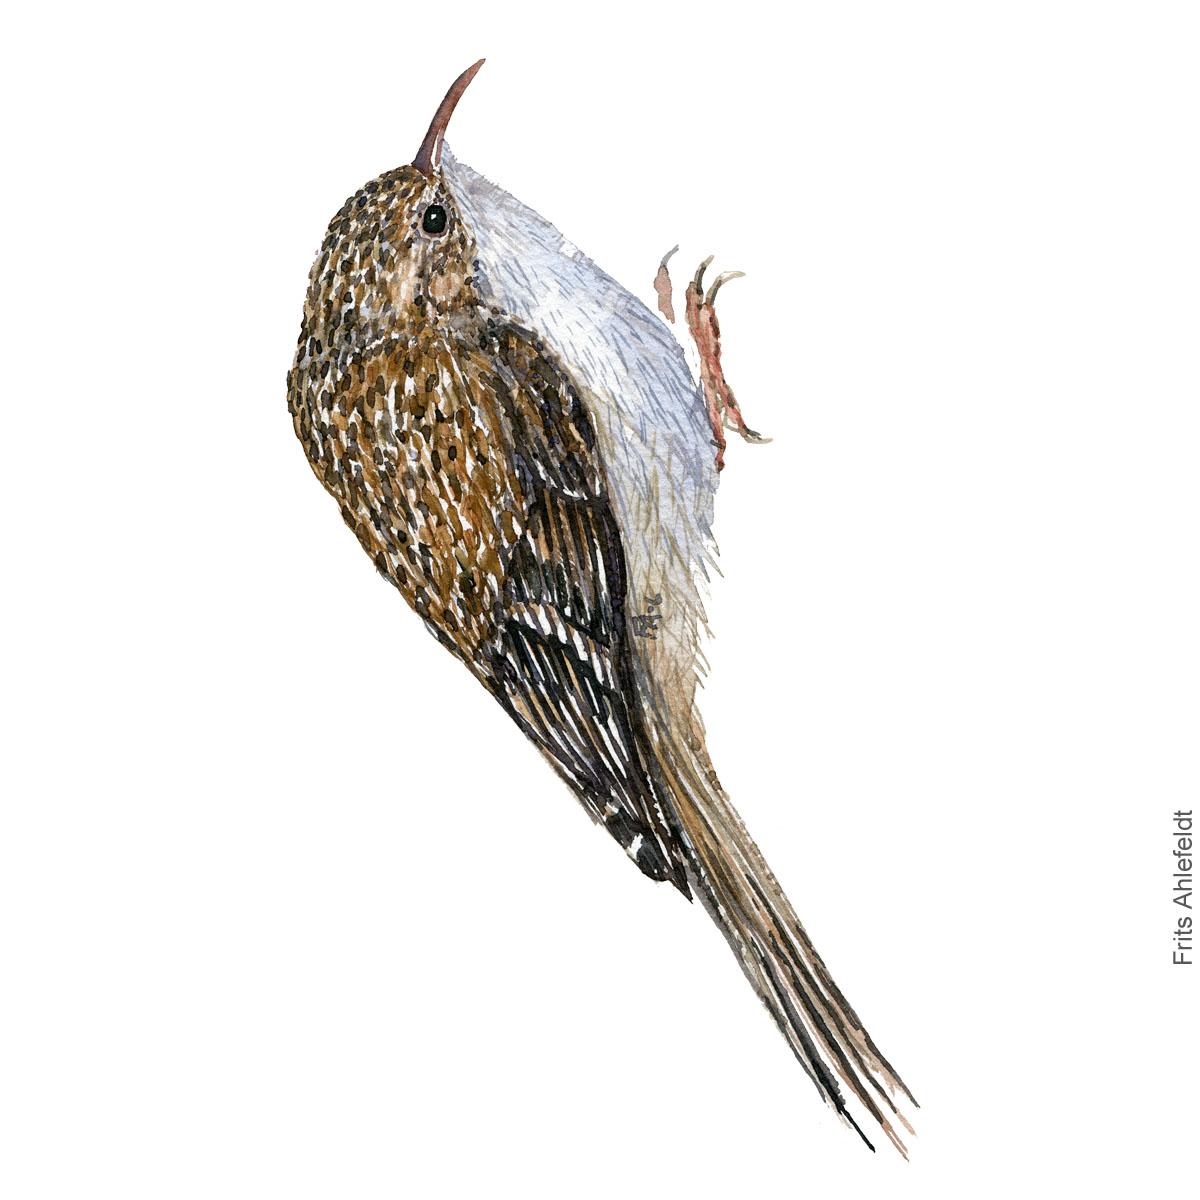 Short toed treekreeper - korttået træløber akvarel. Watercolor painting by Frits Ahlefeldt